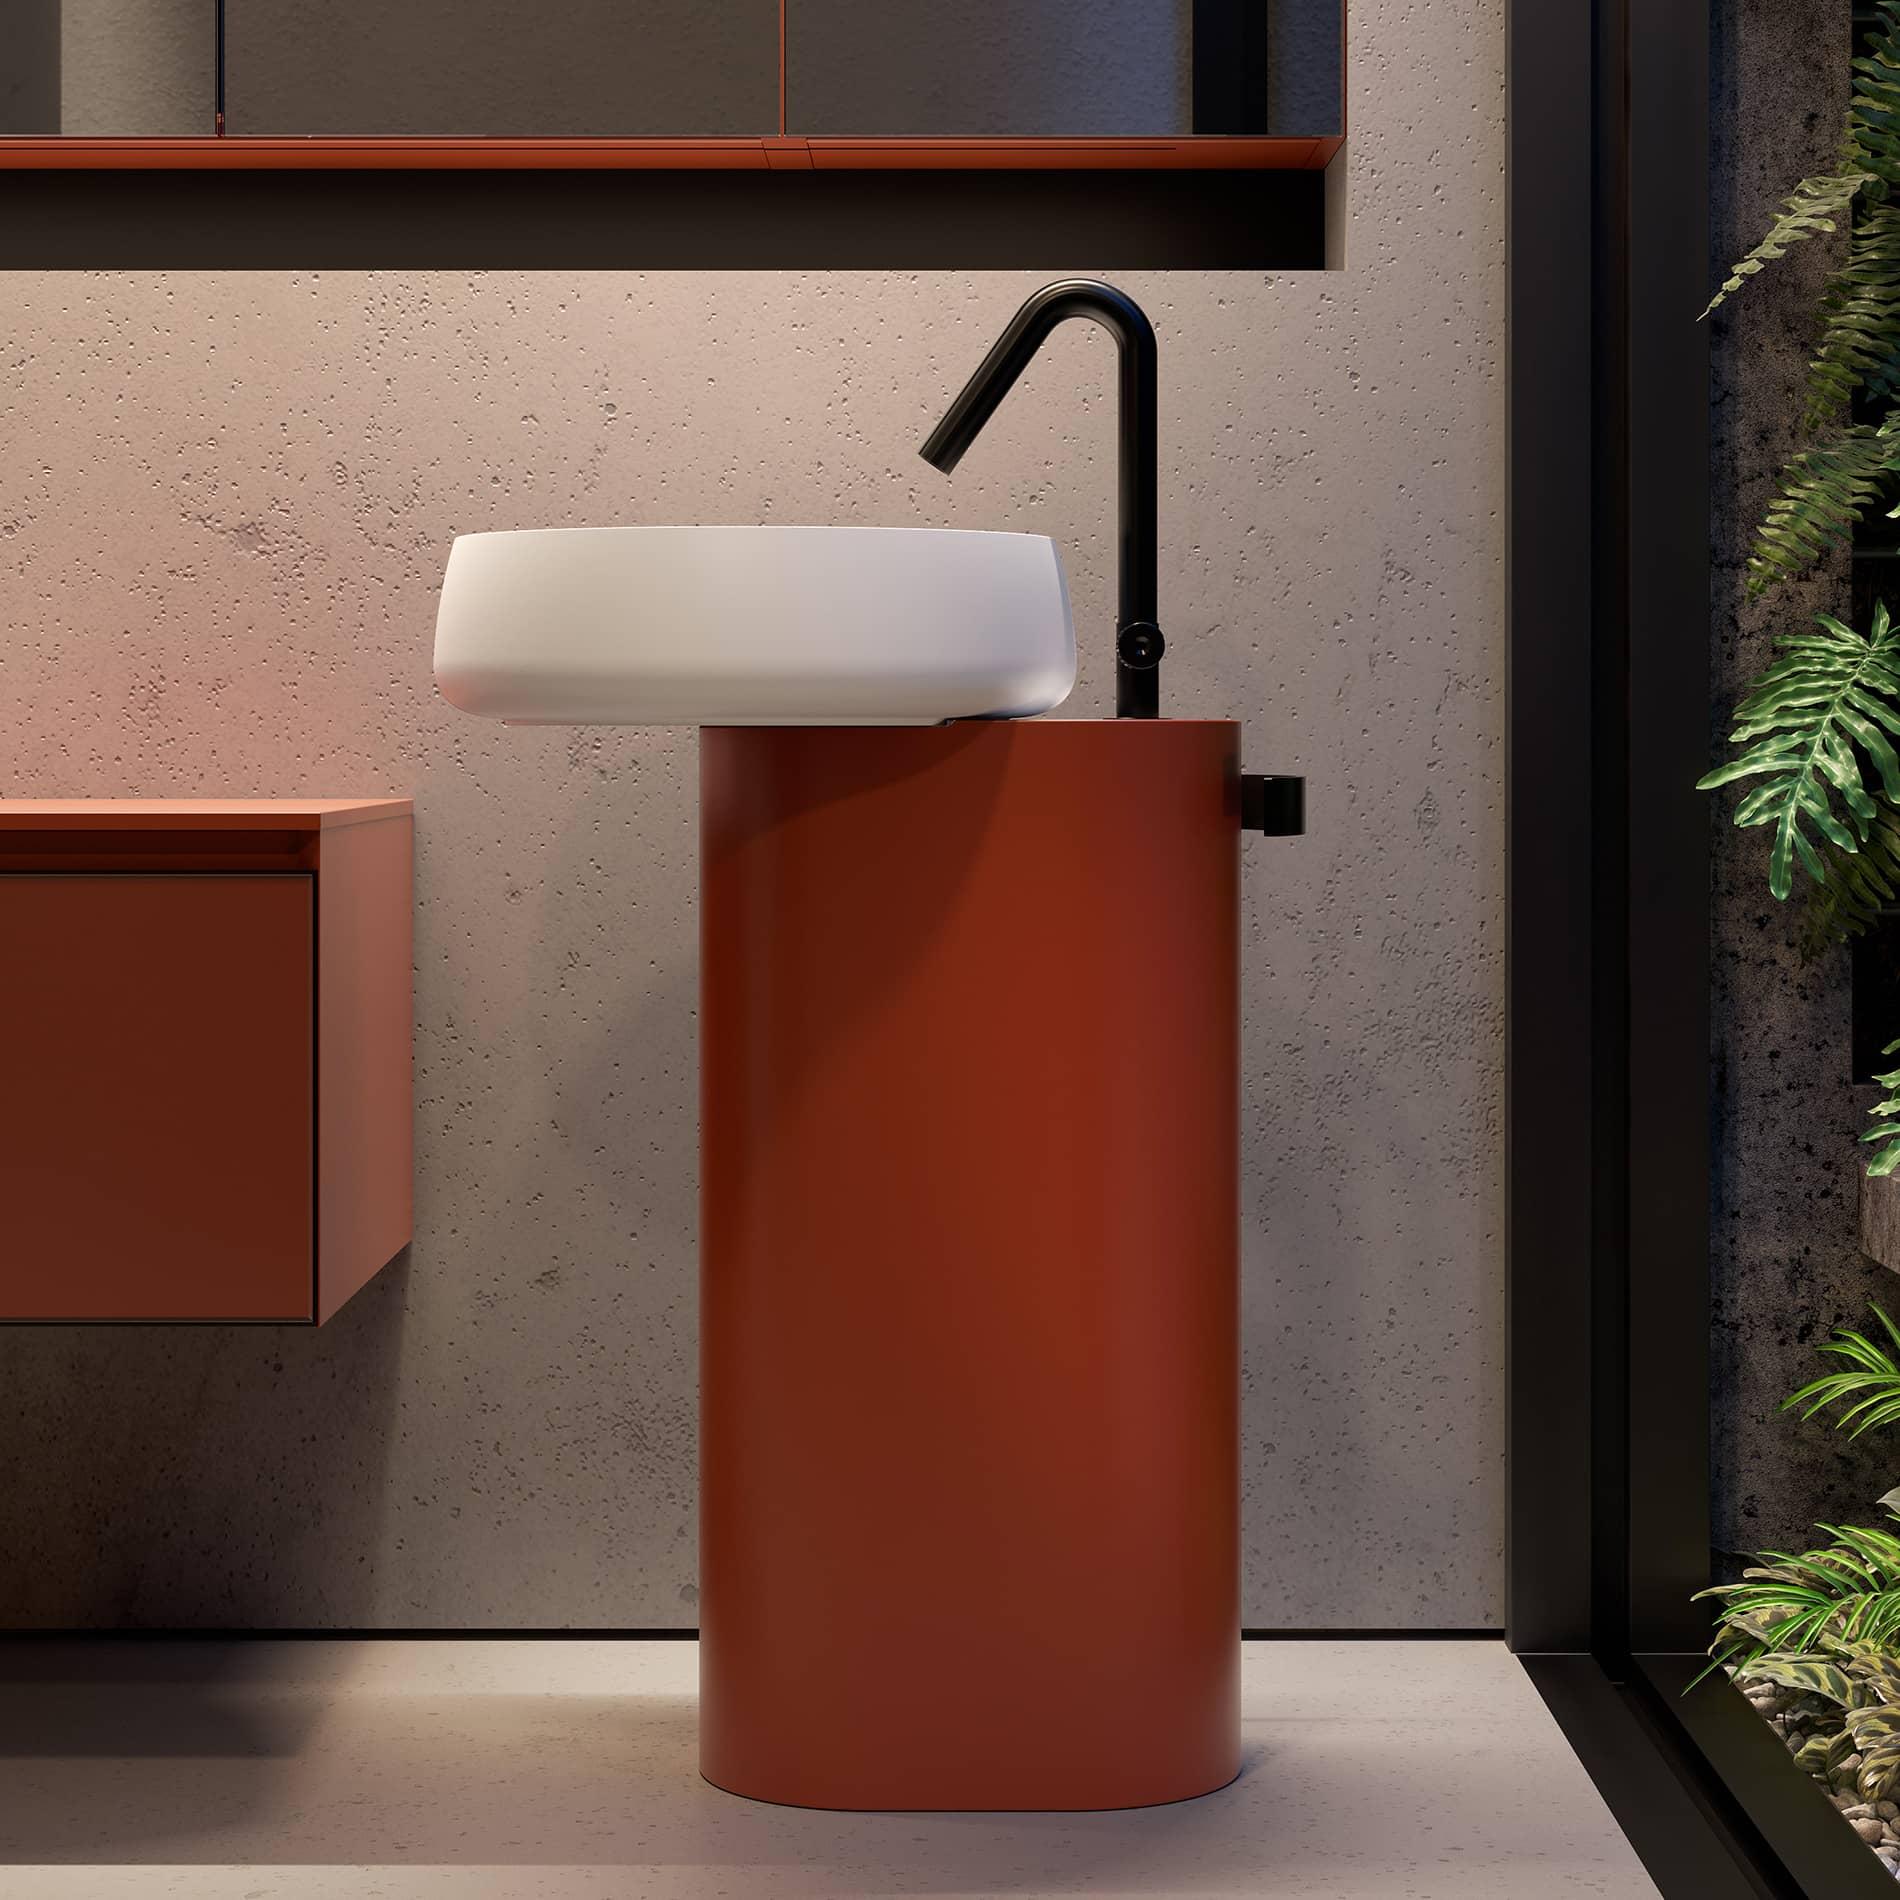 Cristalplant-products-Idea-Group-washbasins-2